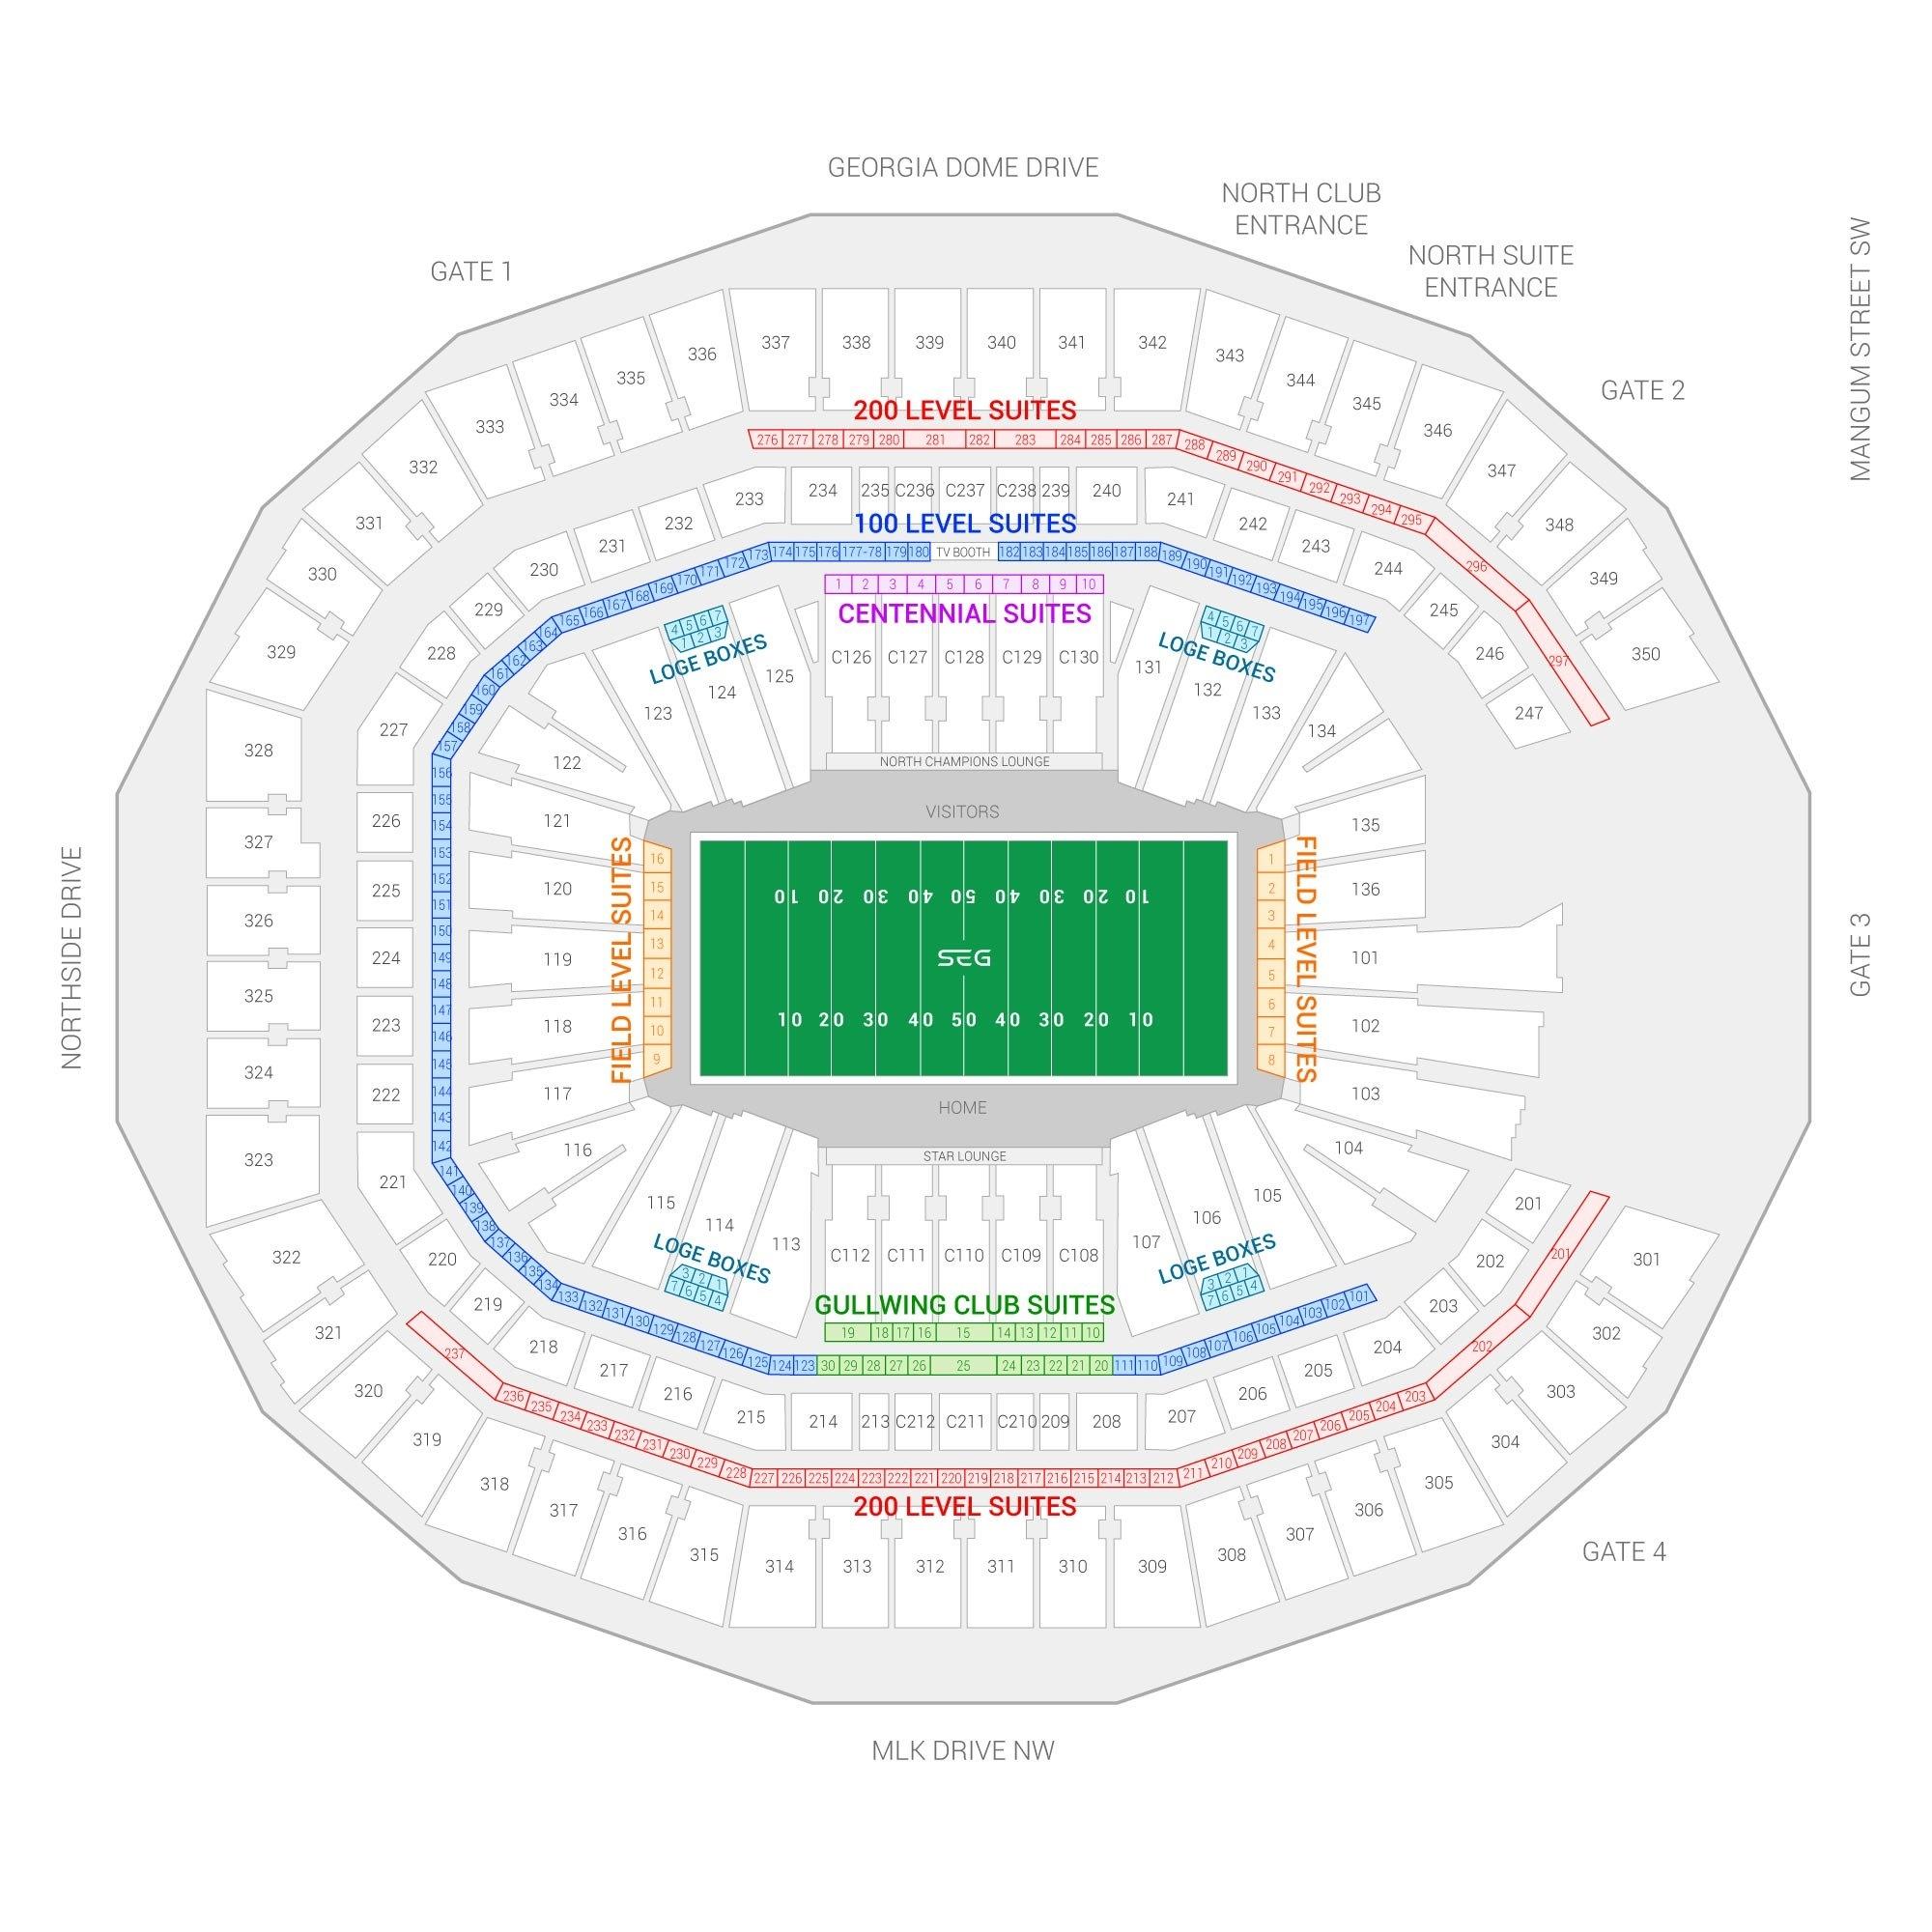 Super Bowl Liii Suite Rentals | Mercedes-Benz Stadium regarding Super Bowl Ticket Map